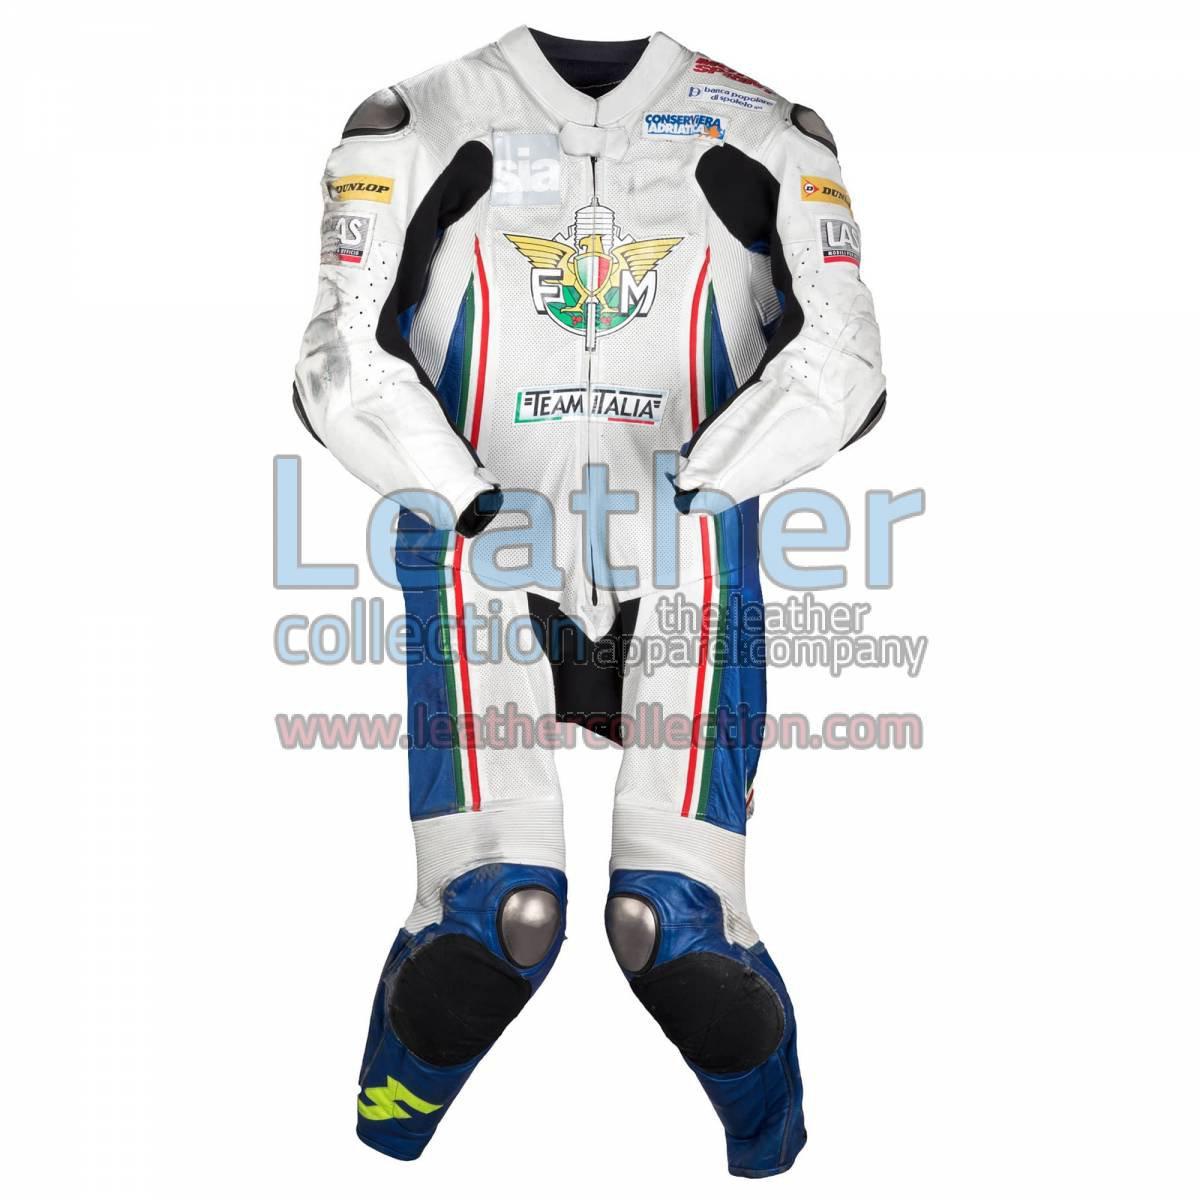 Romano Fenati FIM 2012 Motorcycle Leathers